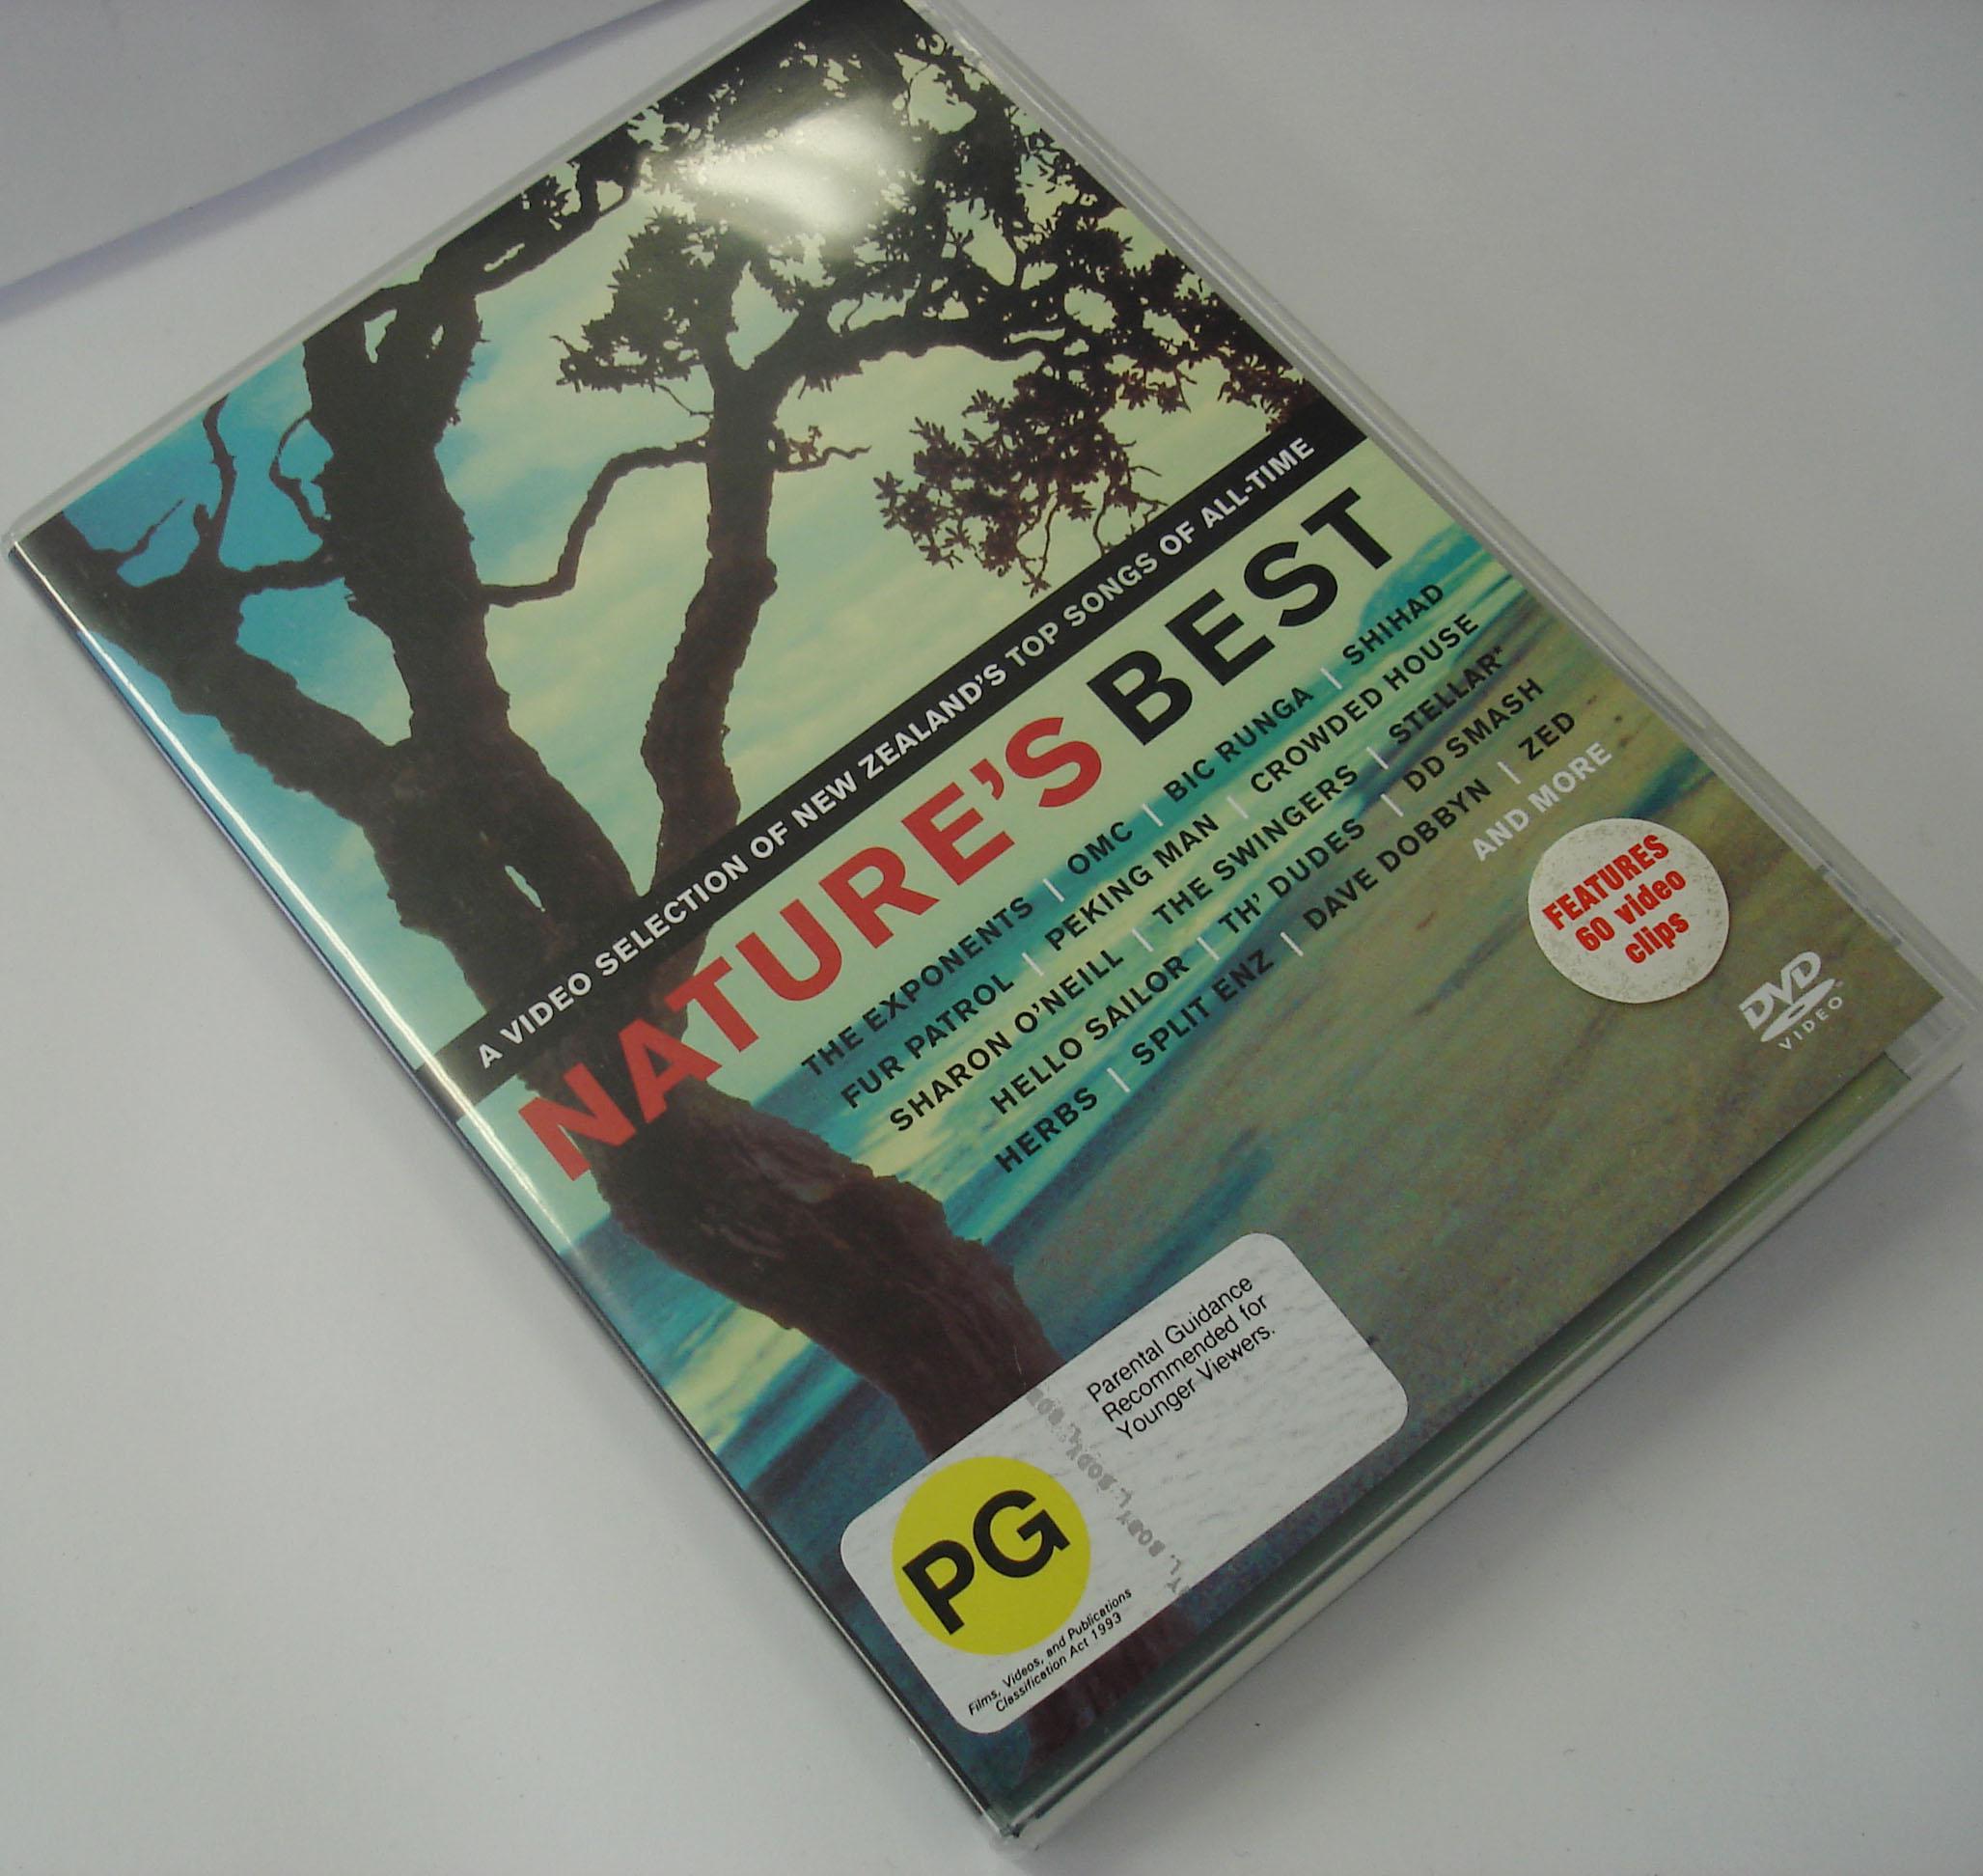 VARIOUS ARTISTS - NATURE'S BEST - DVD